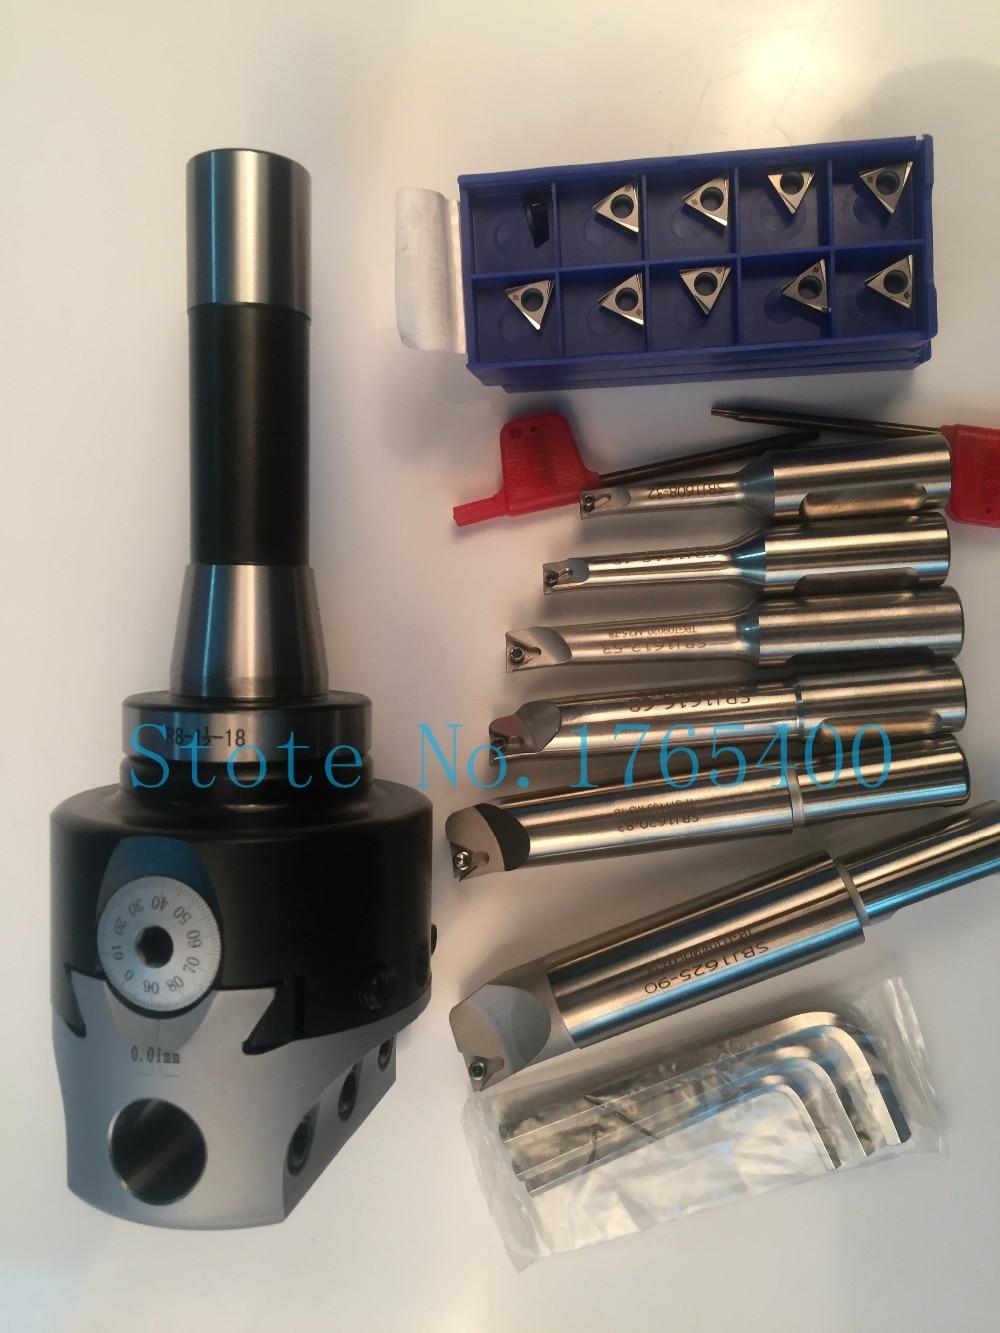 New R8 M12 arbor F1 -18  75mm boring head and shank 18mm 6pcs boring bar and 30pcs carbide inserts